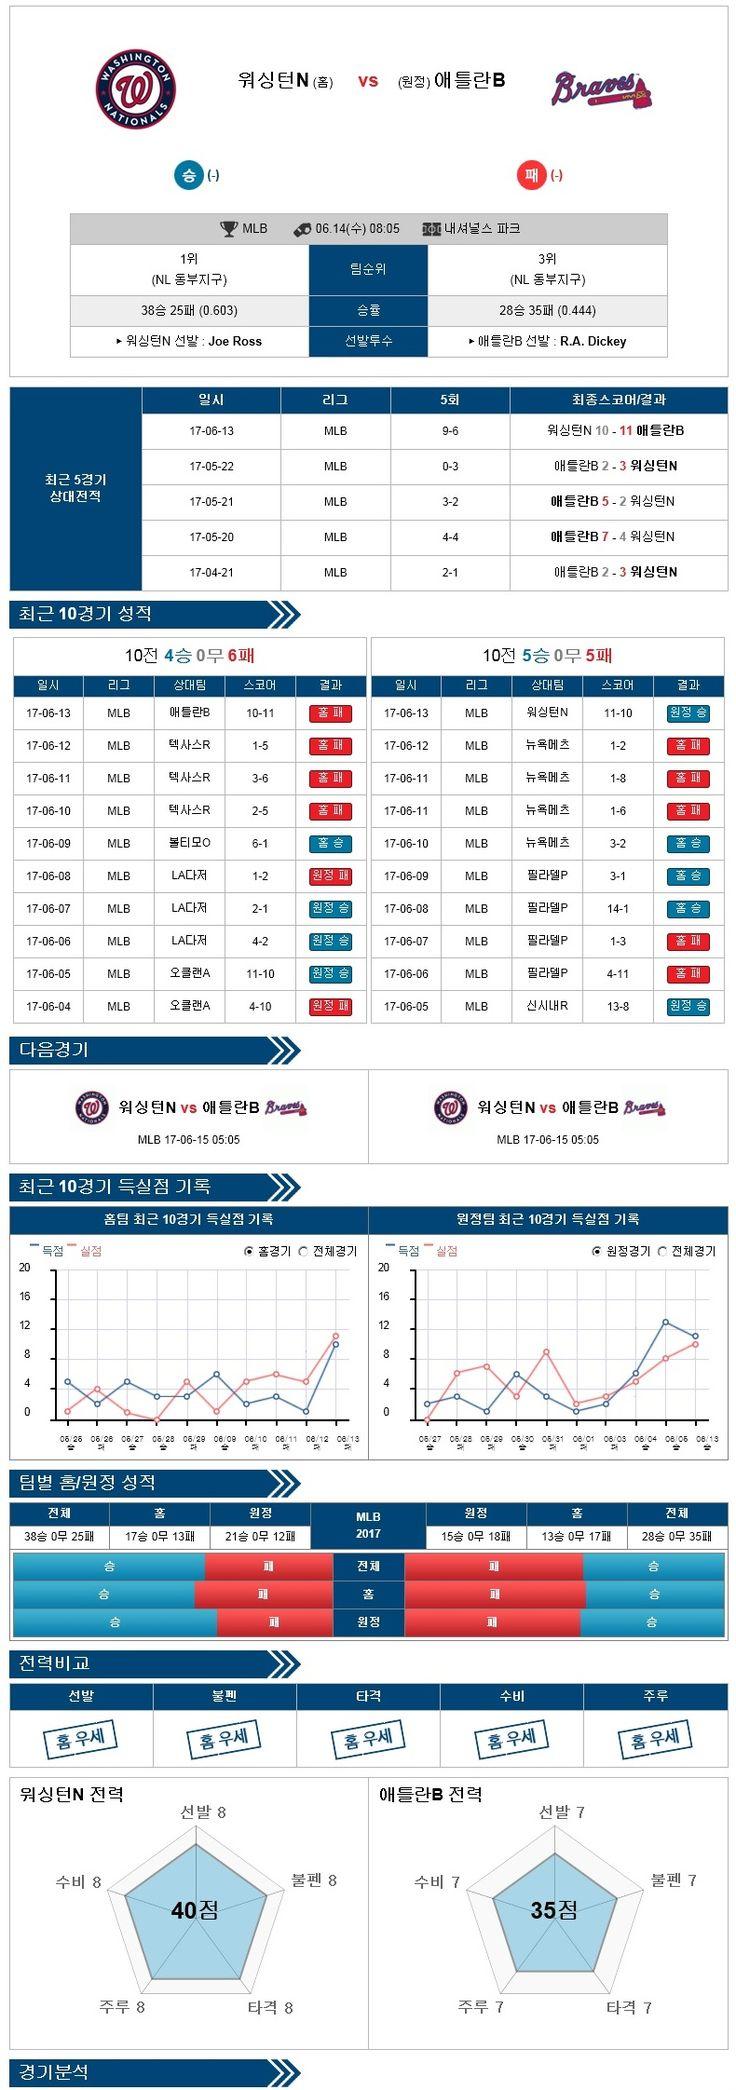 [MLB] 6월 14일 야구분석픽 워싱턴 vs 애틀랜타 ★토토군 분석픽★